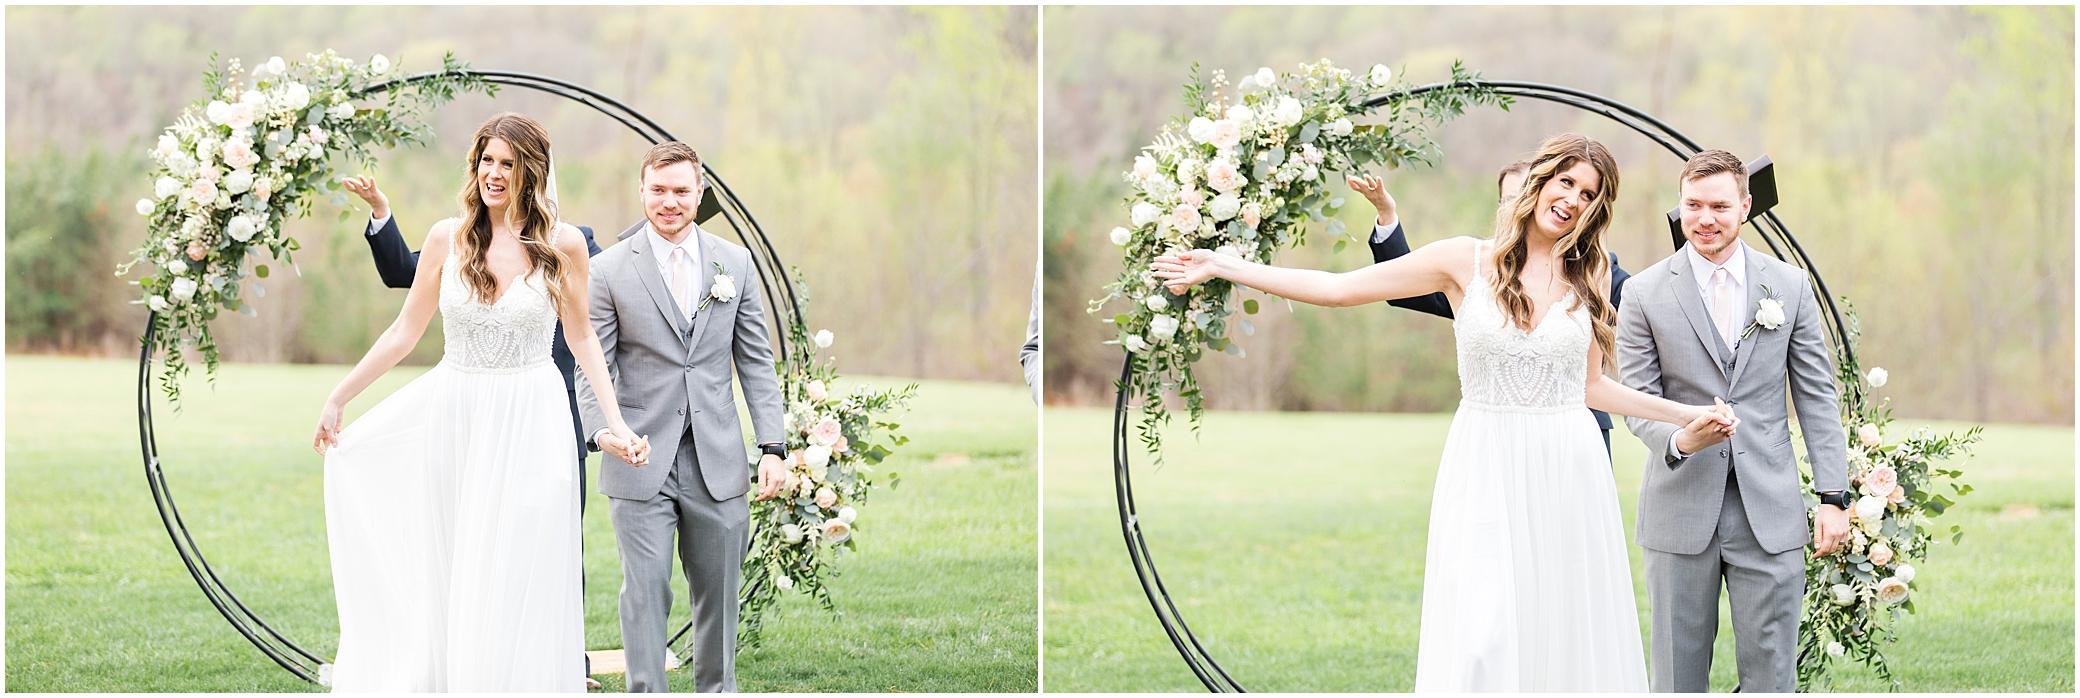 spring wedding ceremony at a wedding at sierra vista